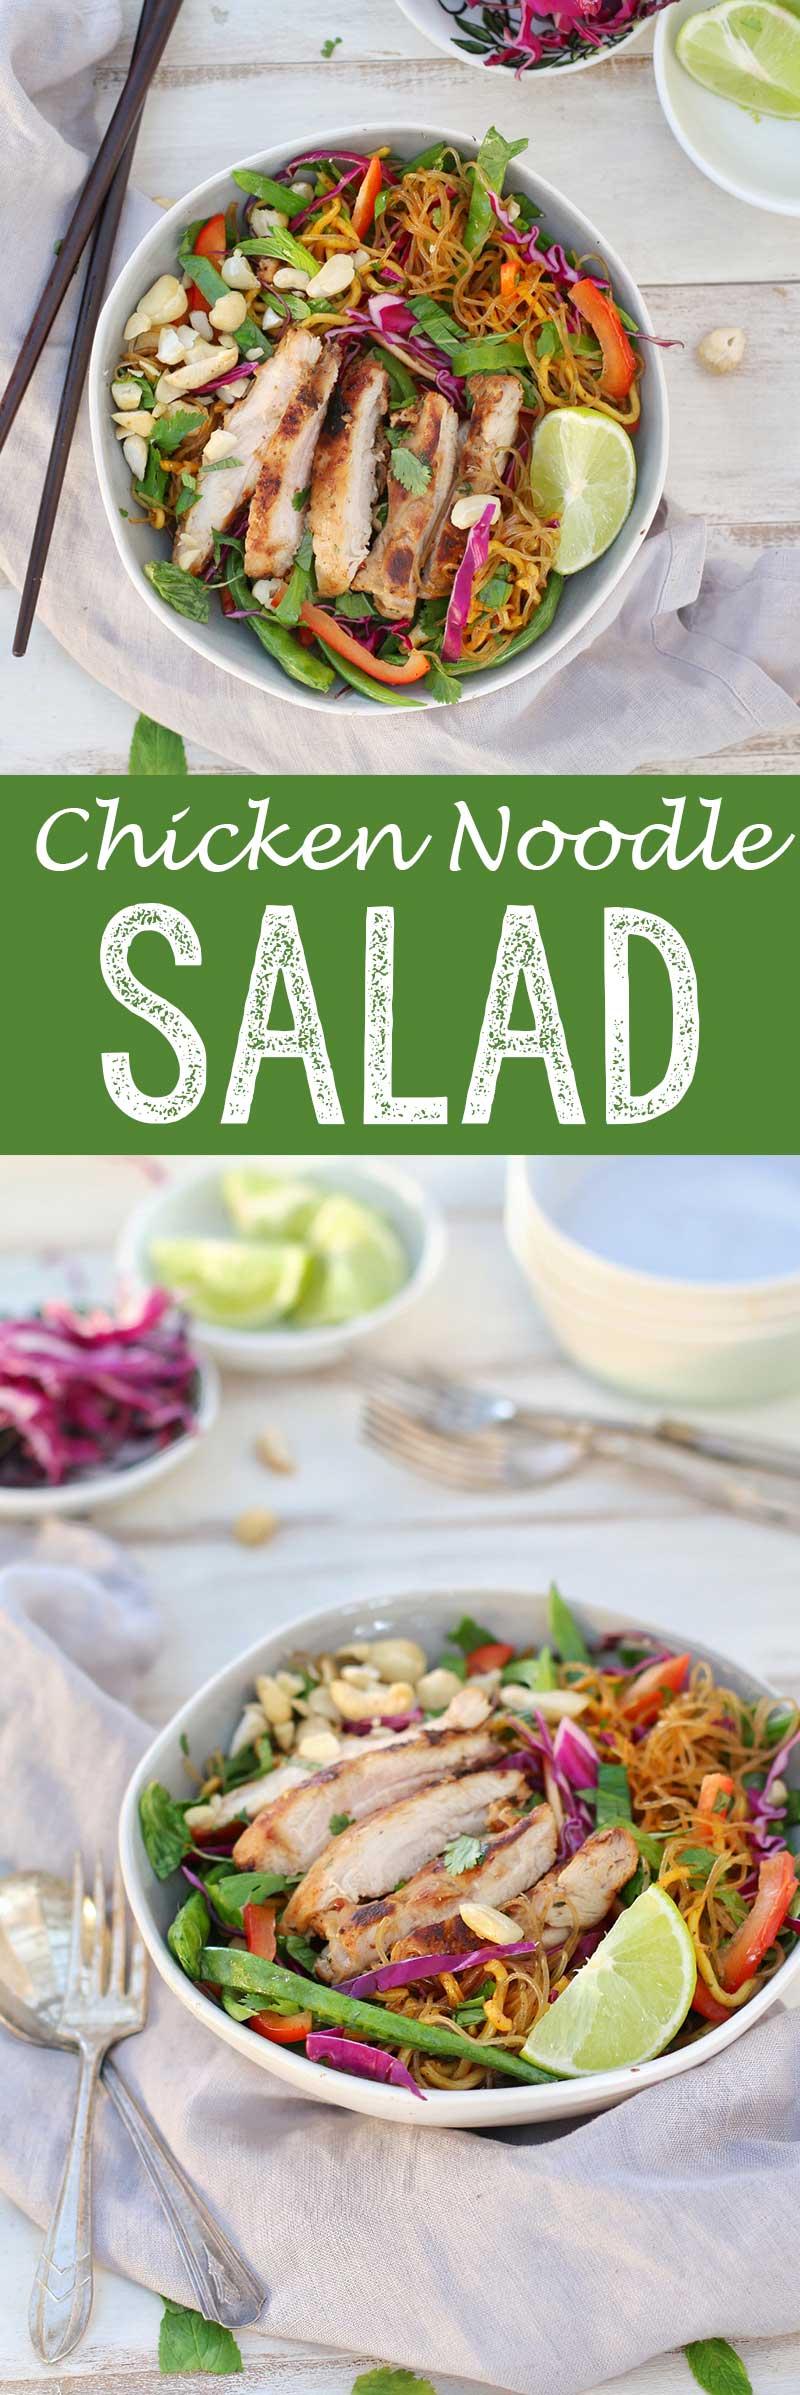 Chicken Noodle Salad. Moist chicken, flavorful noodles, and plenty of veggies.